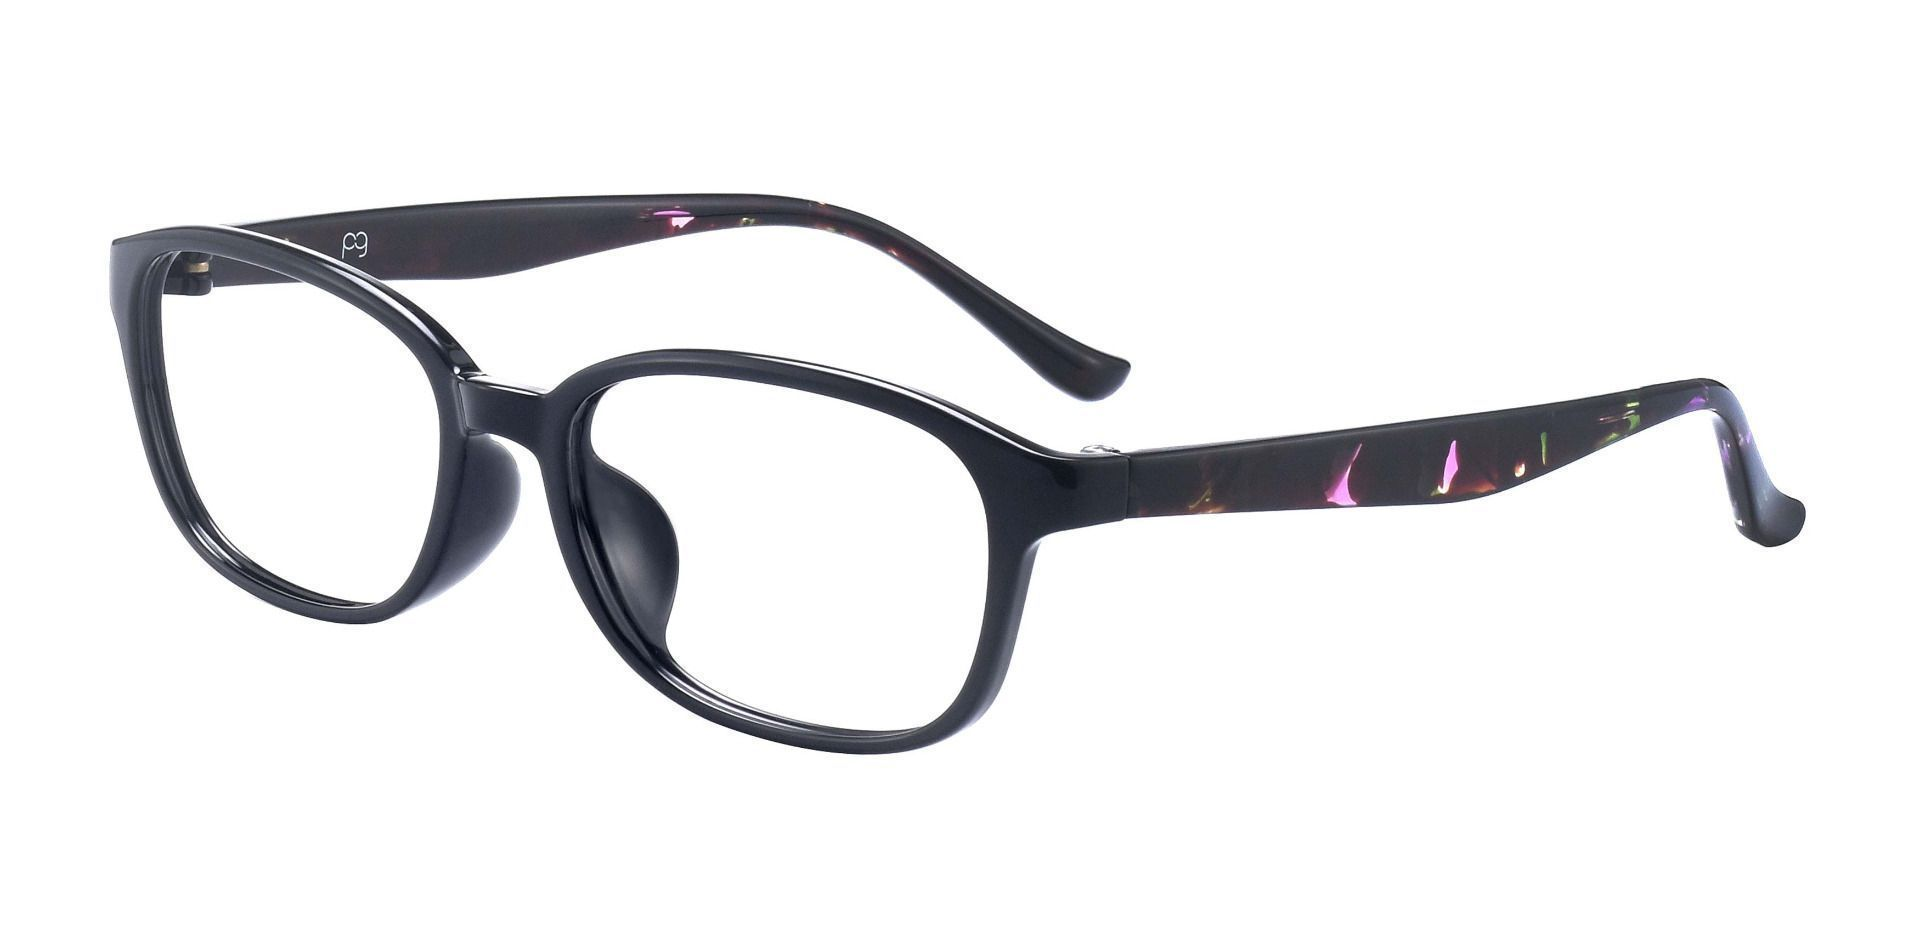 Hemingway Oval Prescription Glasses - Black